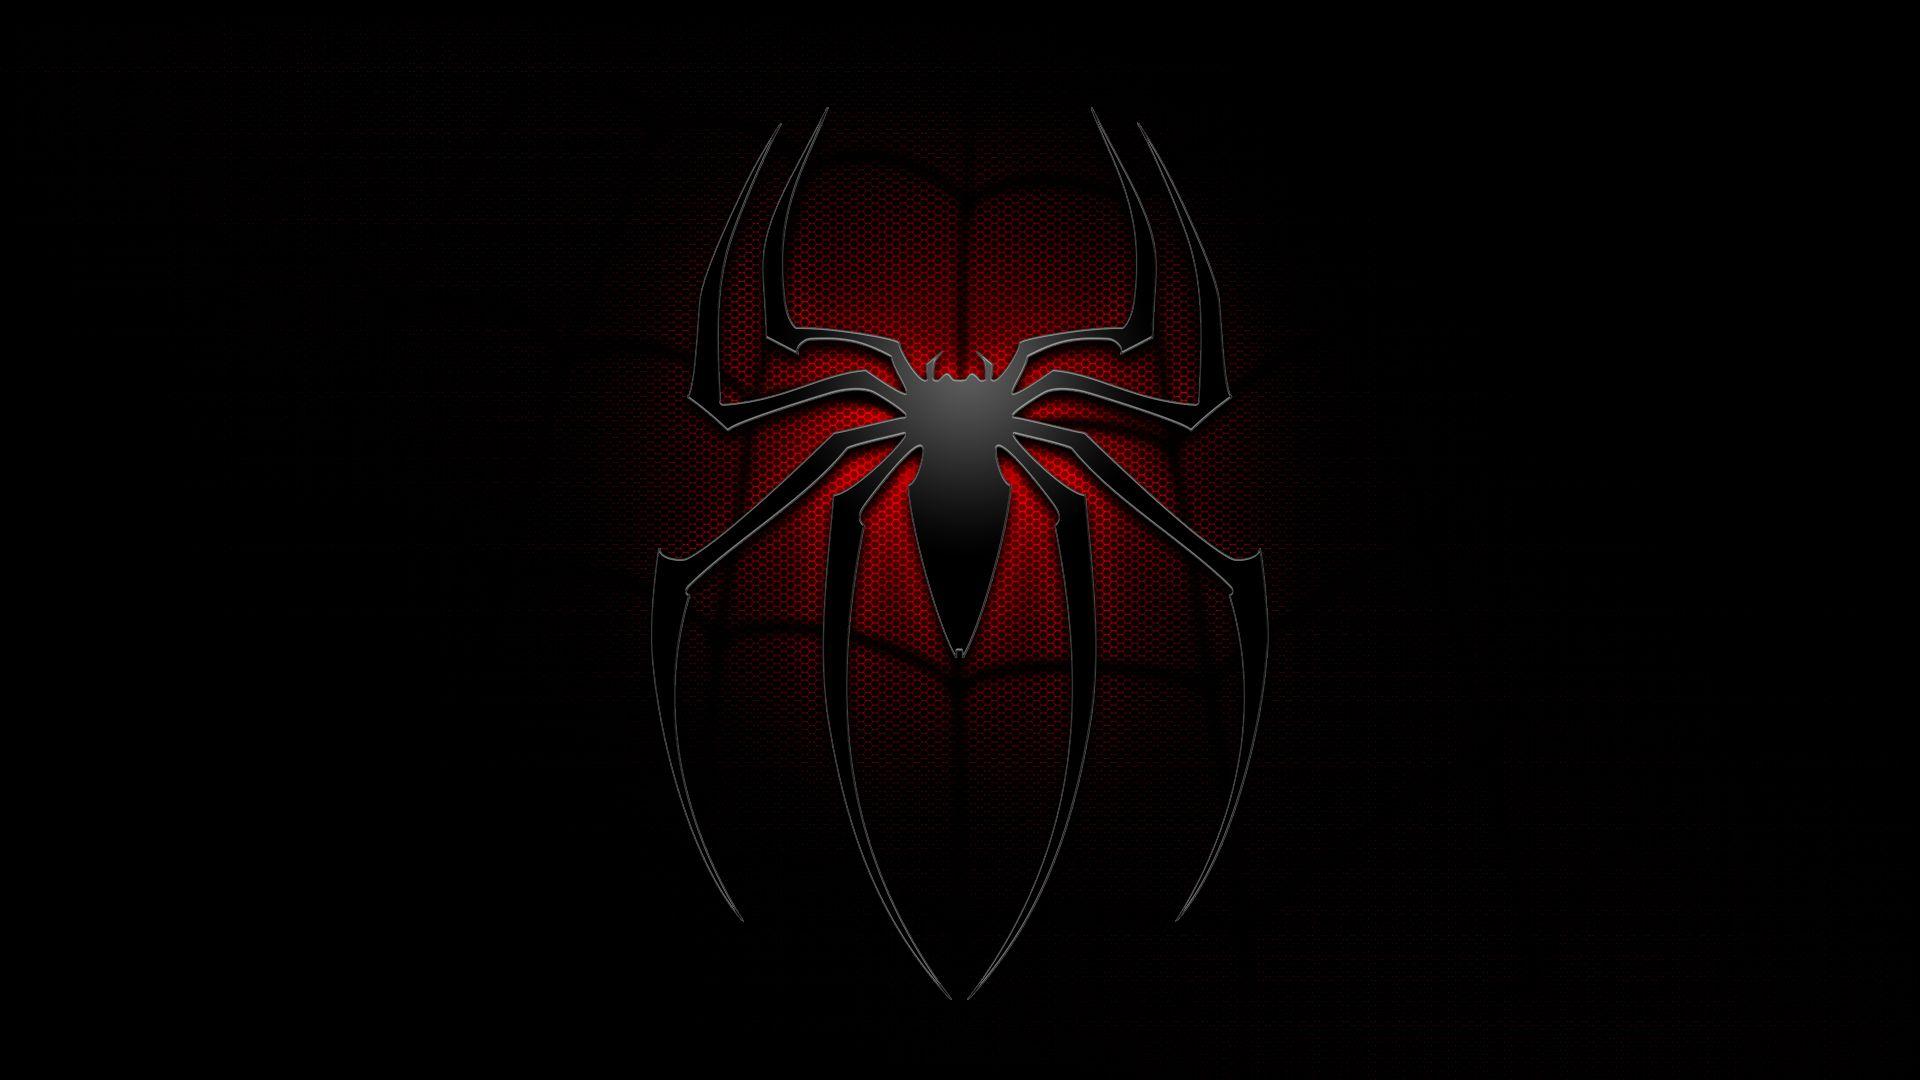 Image For Black Spiderman Logo Wallpaper Free Desktop